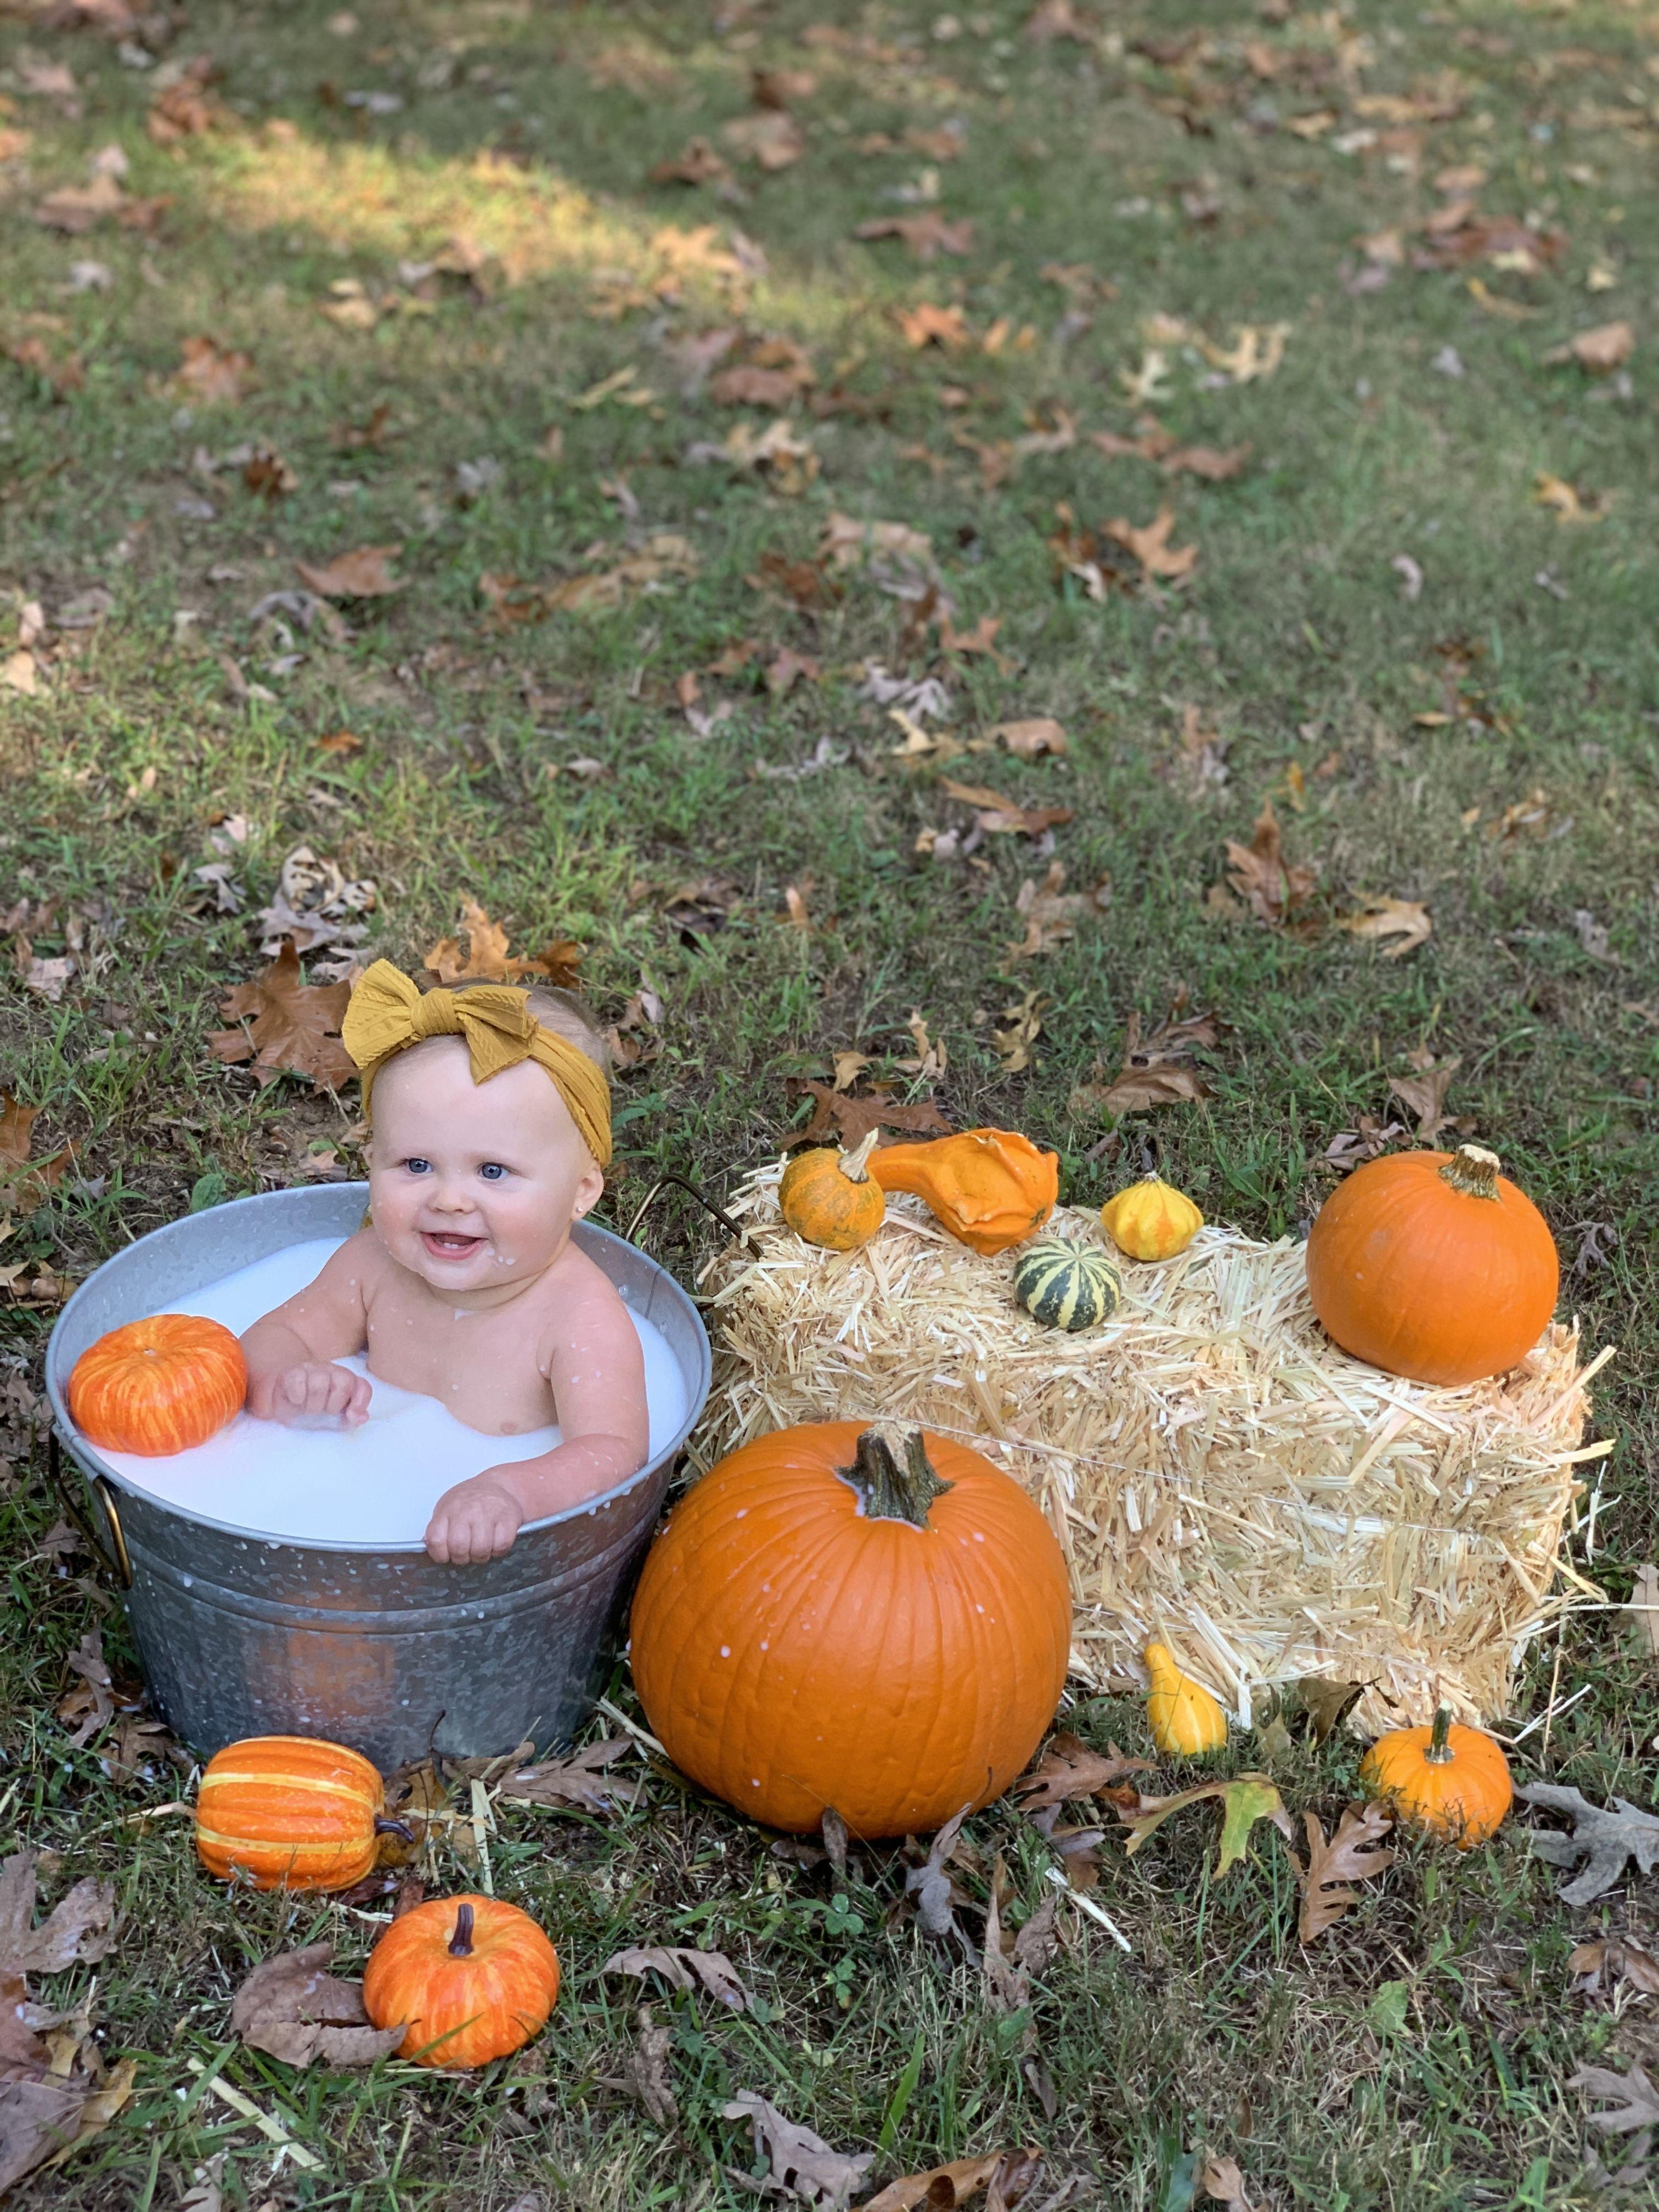 Fall baby milk bath!! #fallfun #pumkinmilkbath #babymilkbath #fallmilkbathbaby #fallmilkbathbaby Fall baby milk bath!! #fallfun #pumkinmilkbath #babymilkbath #fallmilkbathbaby #fallmilkbath